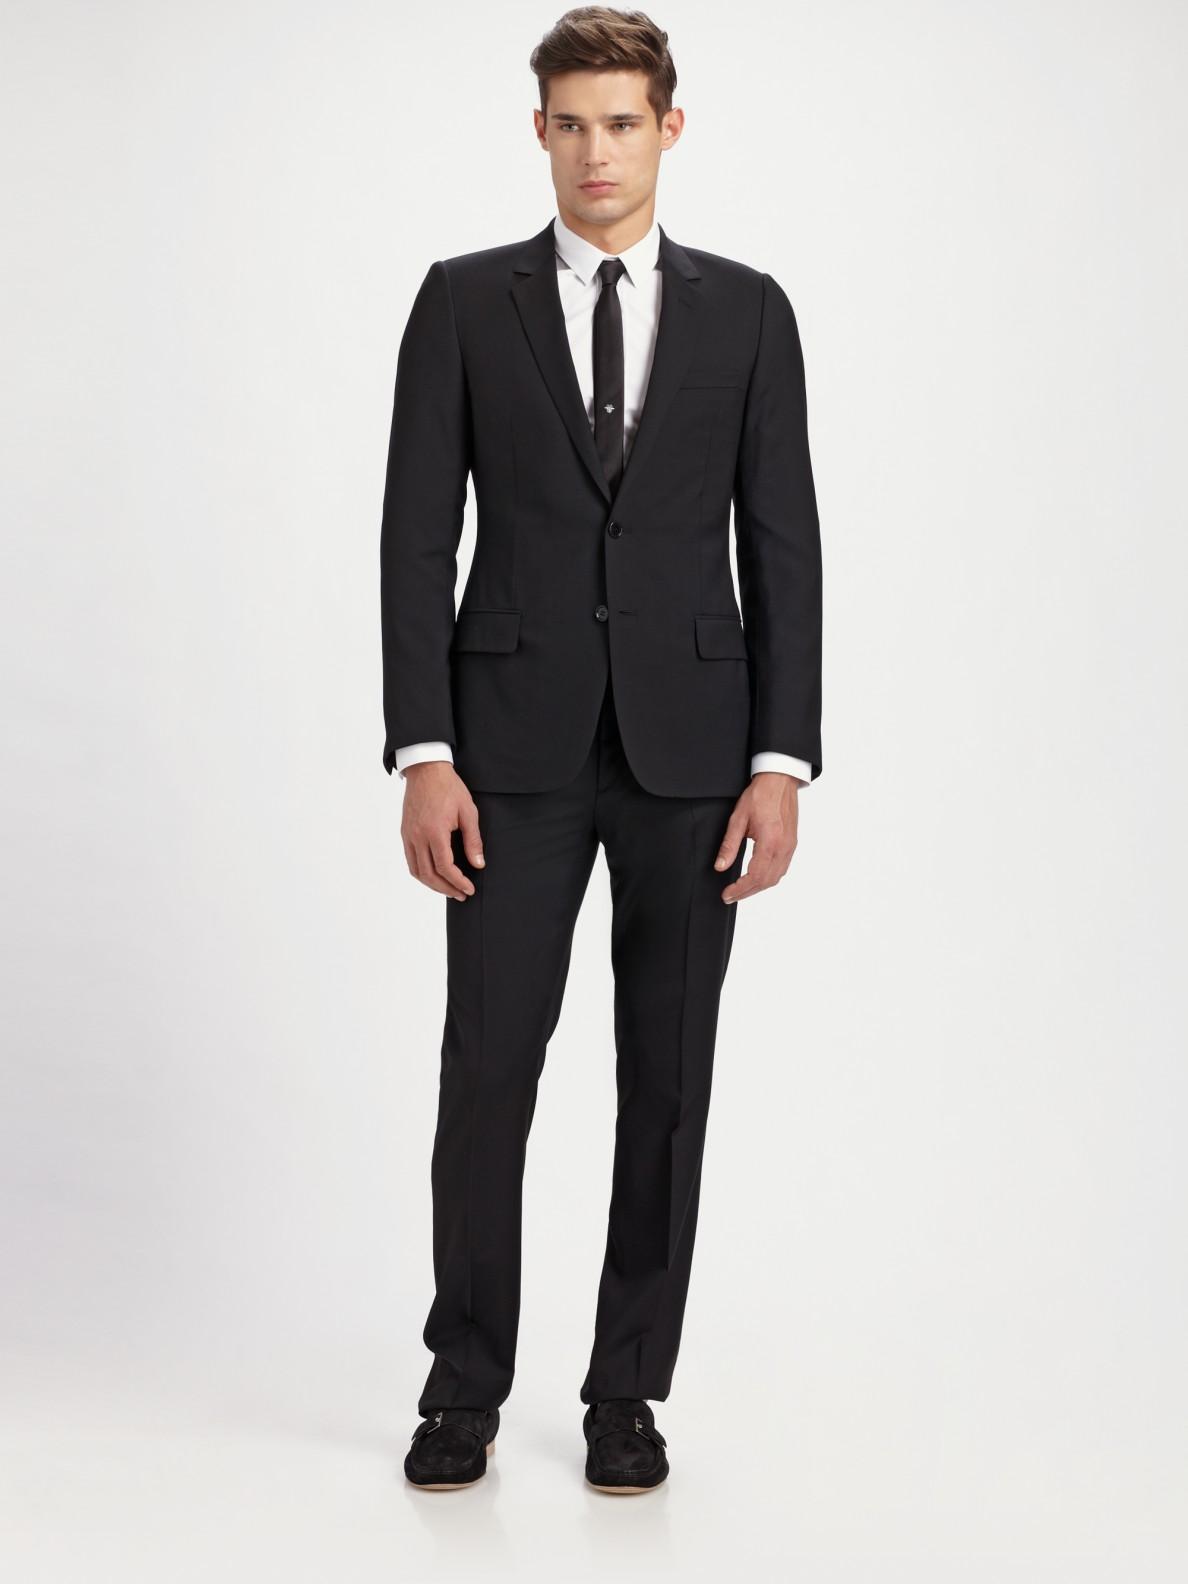 Dior Homme Classic Drop 10 Suit In Black For Men Lyst